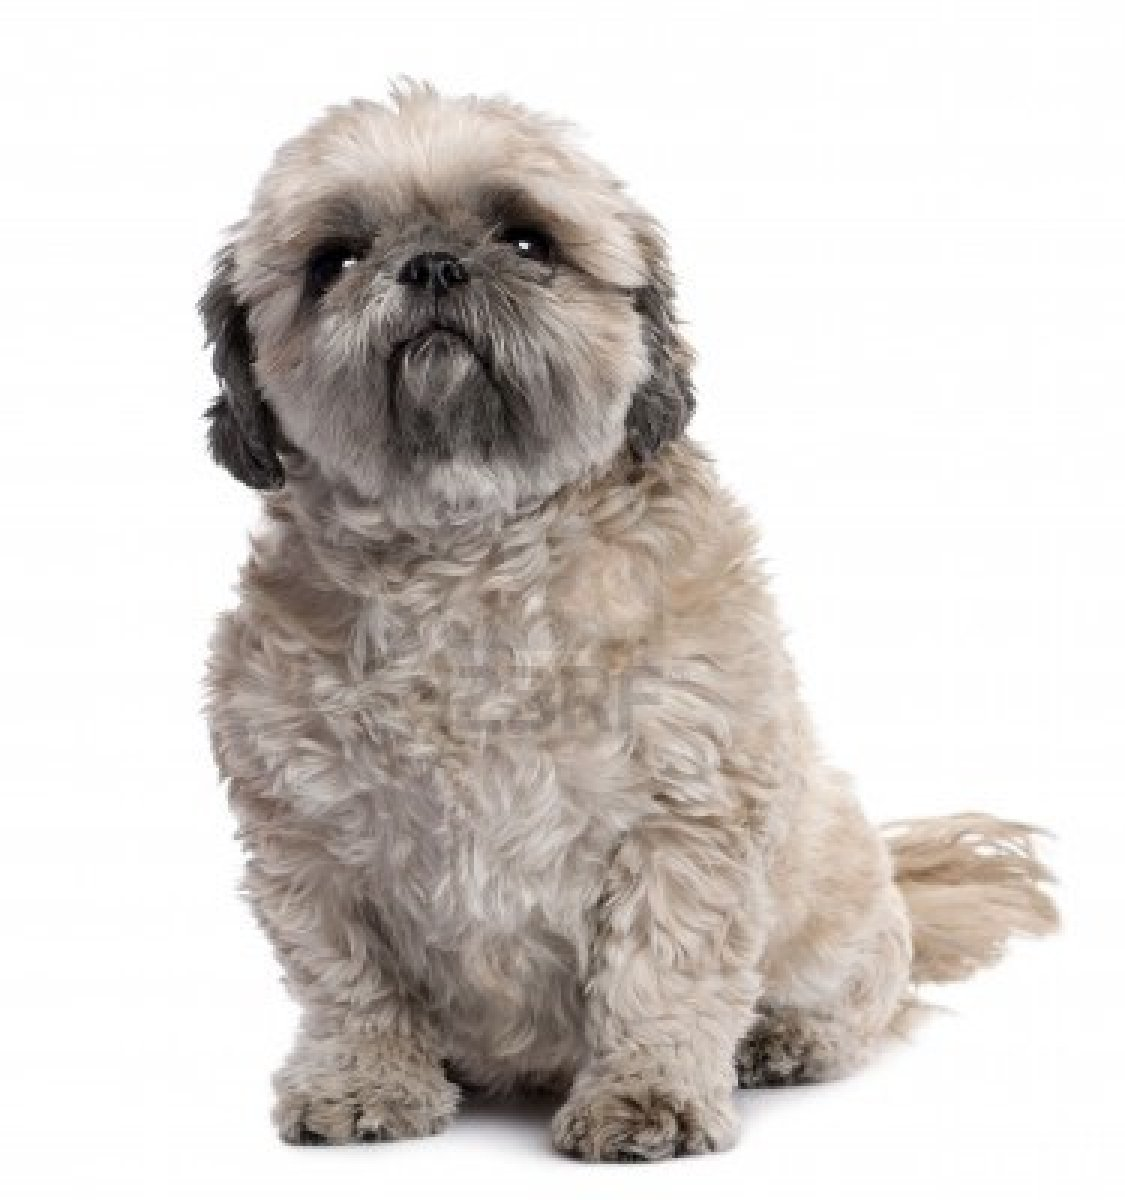 Blue Eyed Shih Tzu Cute Puppy Dogs Shih Tzu Puppies